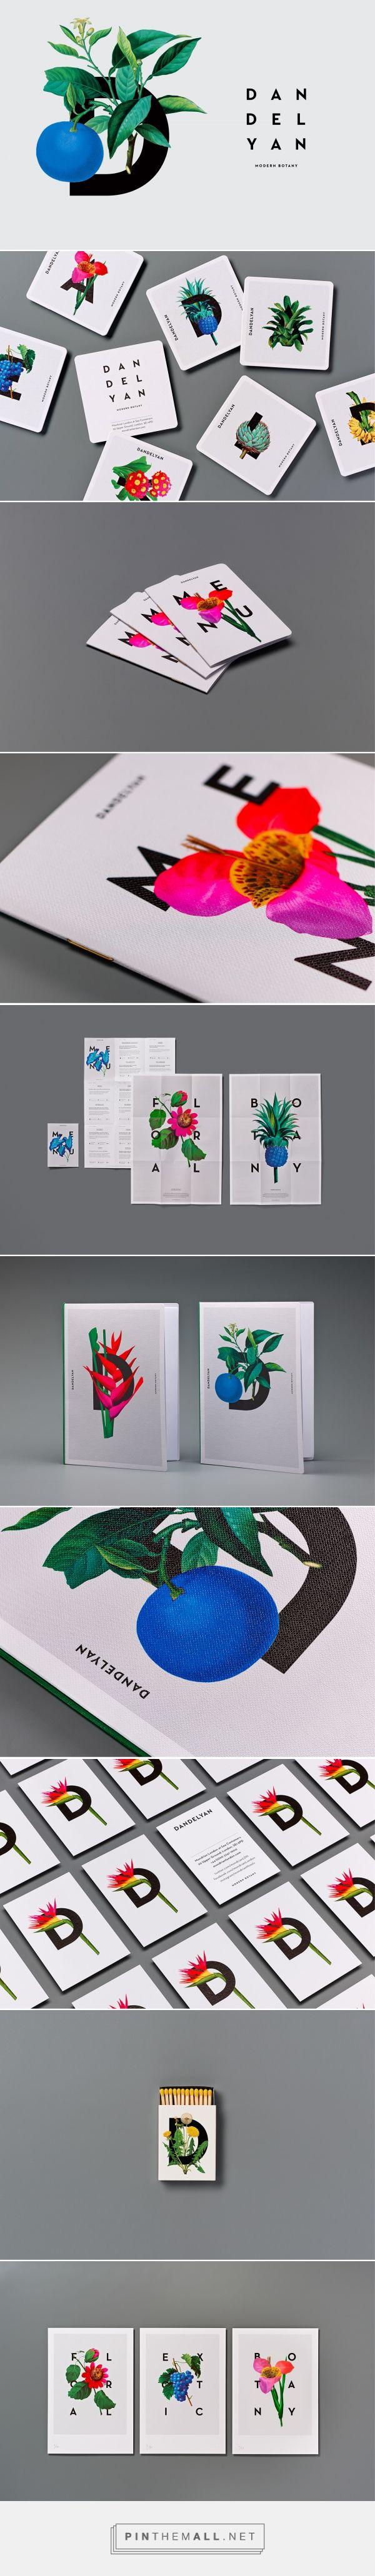 Dandelya Modern Botany Bar Branding by Tim Donaldson   Fivestar Branding Agency – Design and Branding Agency & Curated Inspiration Gallery